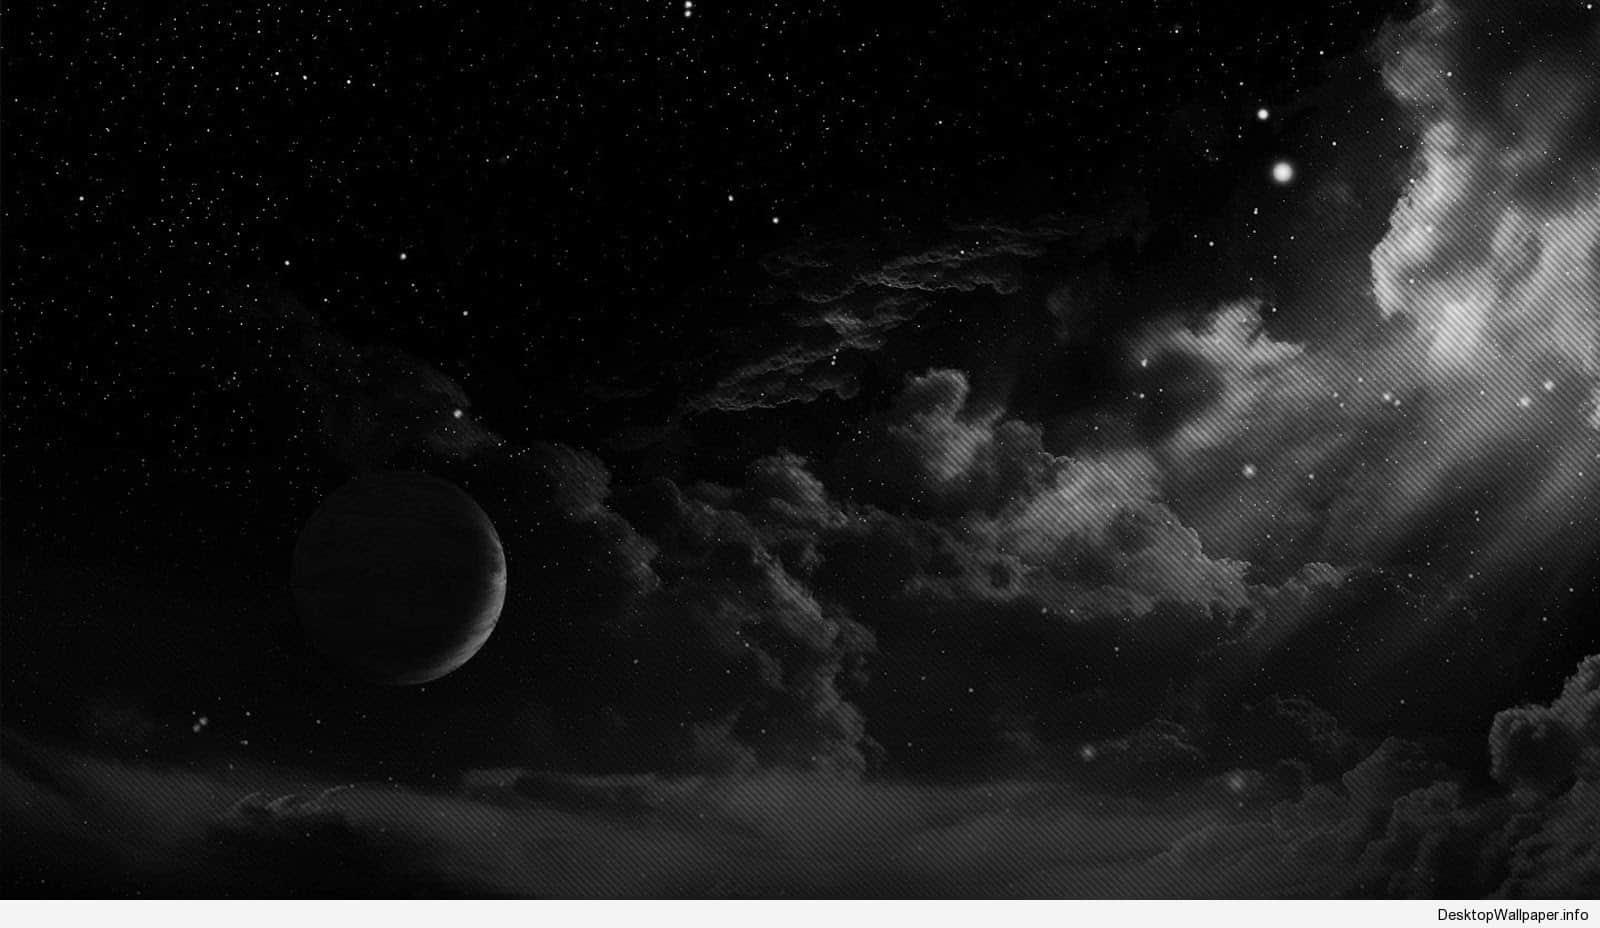 Dark Aesthetic Desktop Wallpaper Posted By John Tremblay